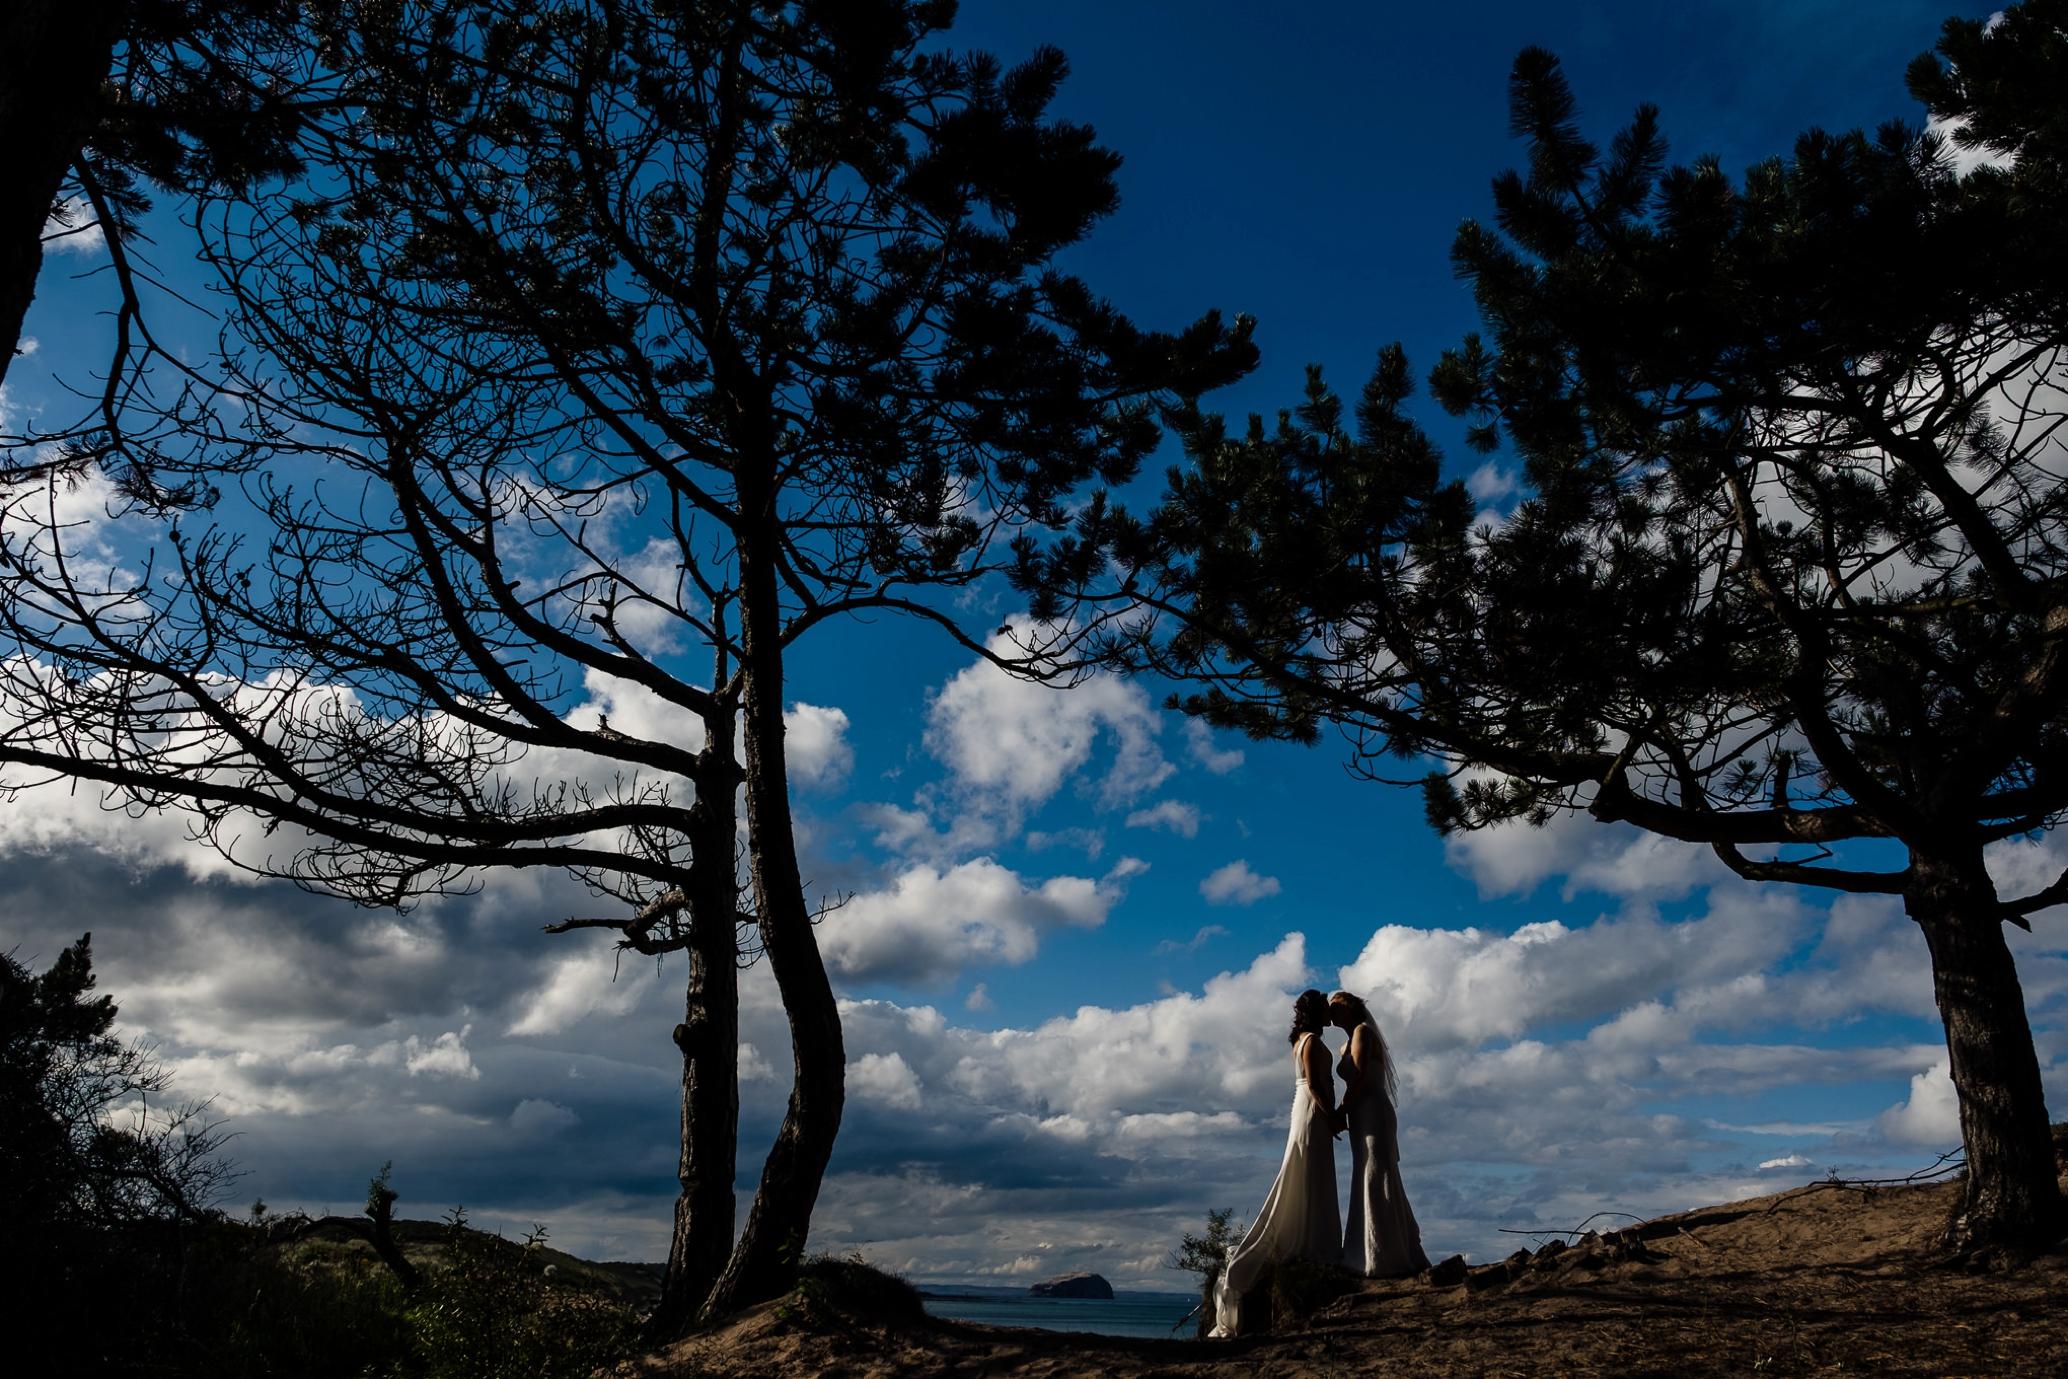 20170729_euan robertson weddings_059_WEB.jpg